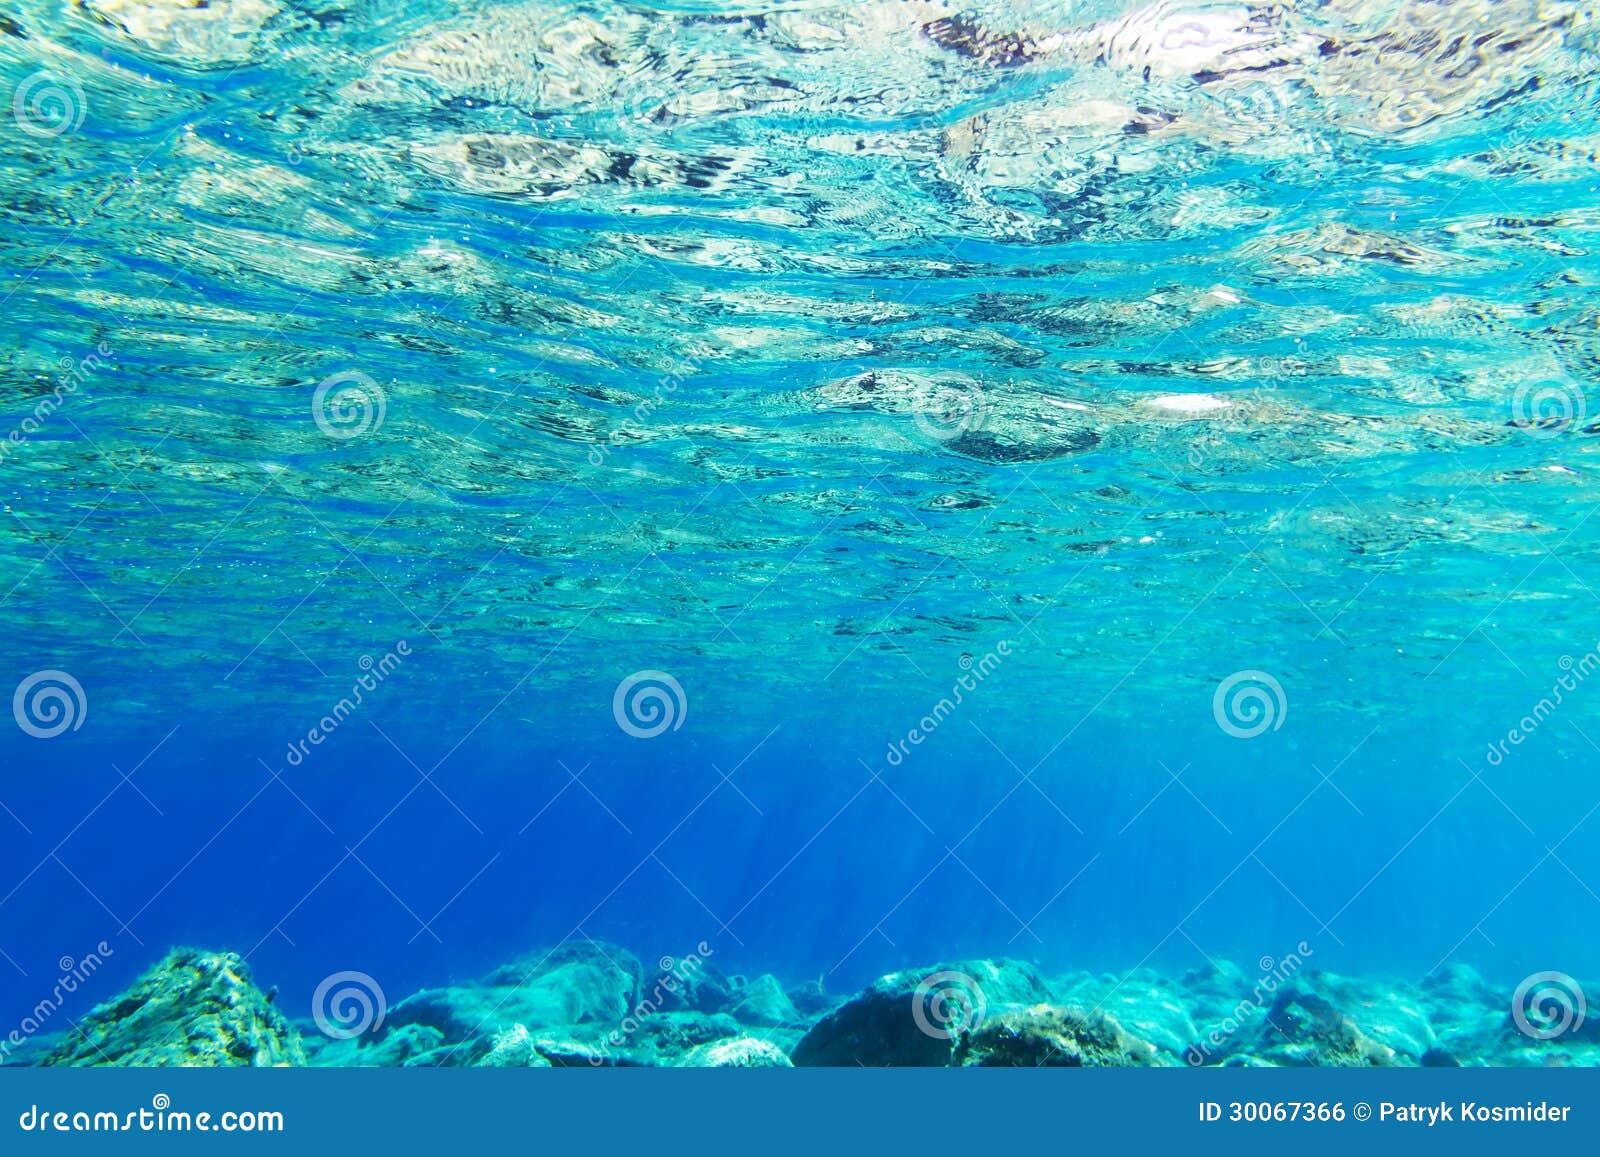 Underwater background of Aegean Sea